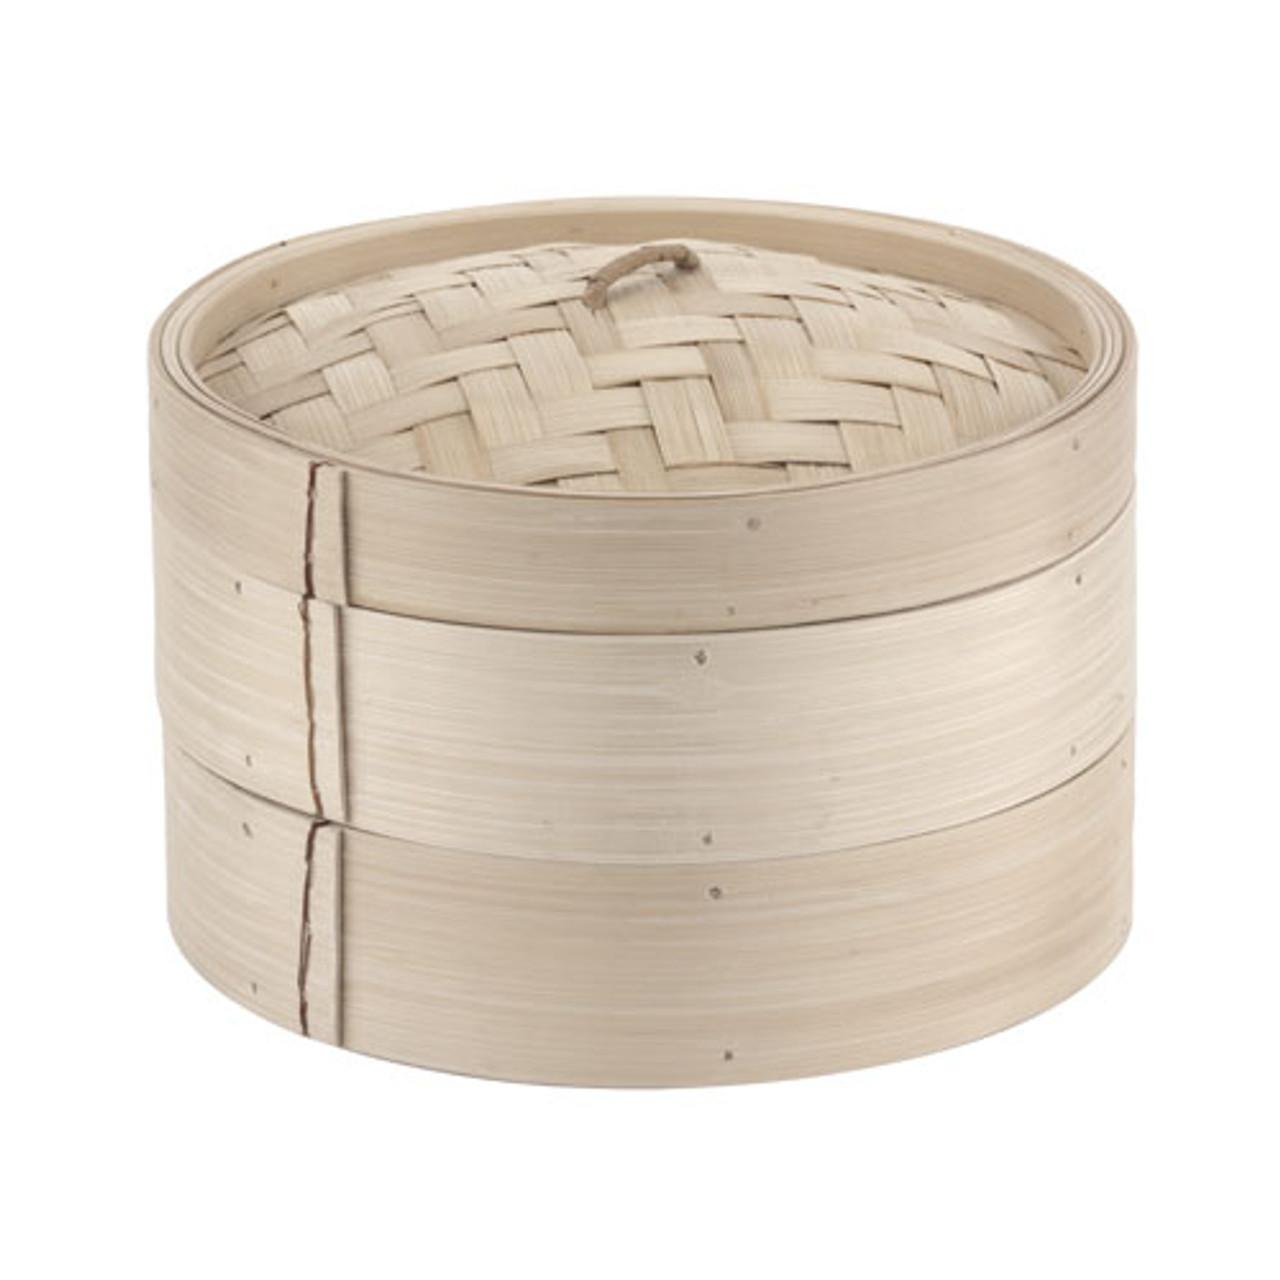 9 7/8 Bamboo Steamer Set (2+1),